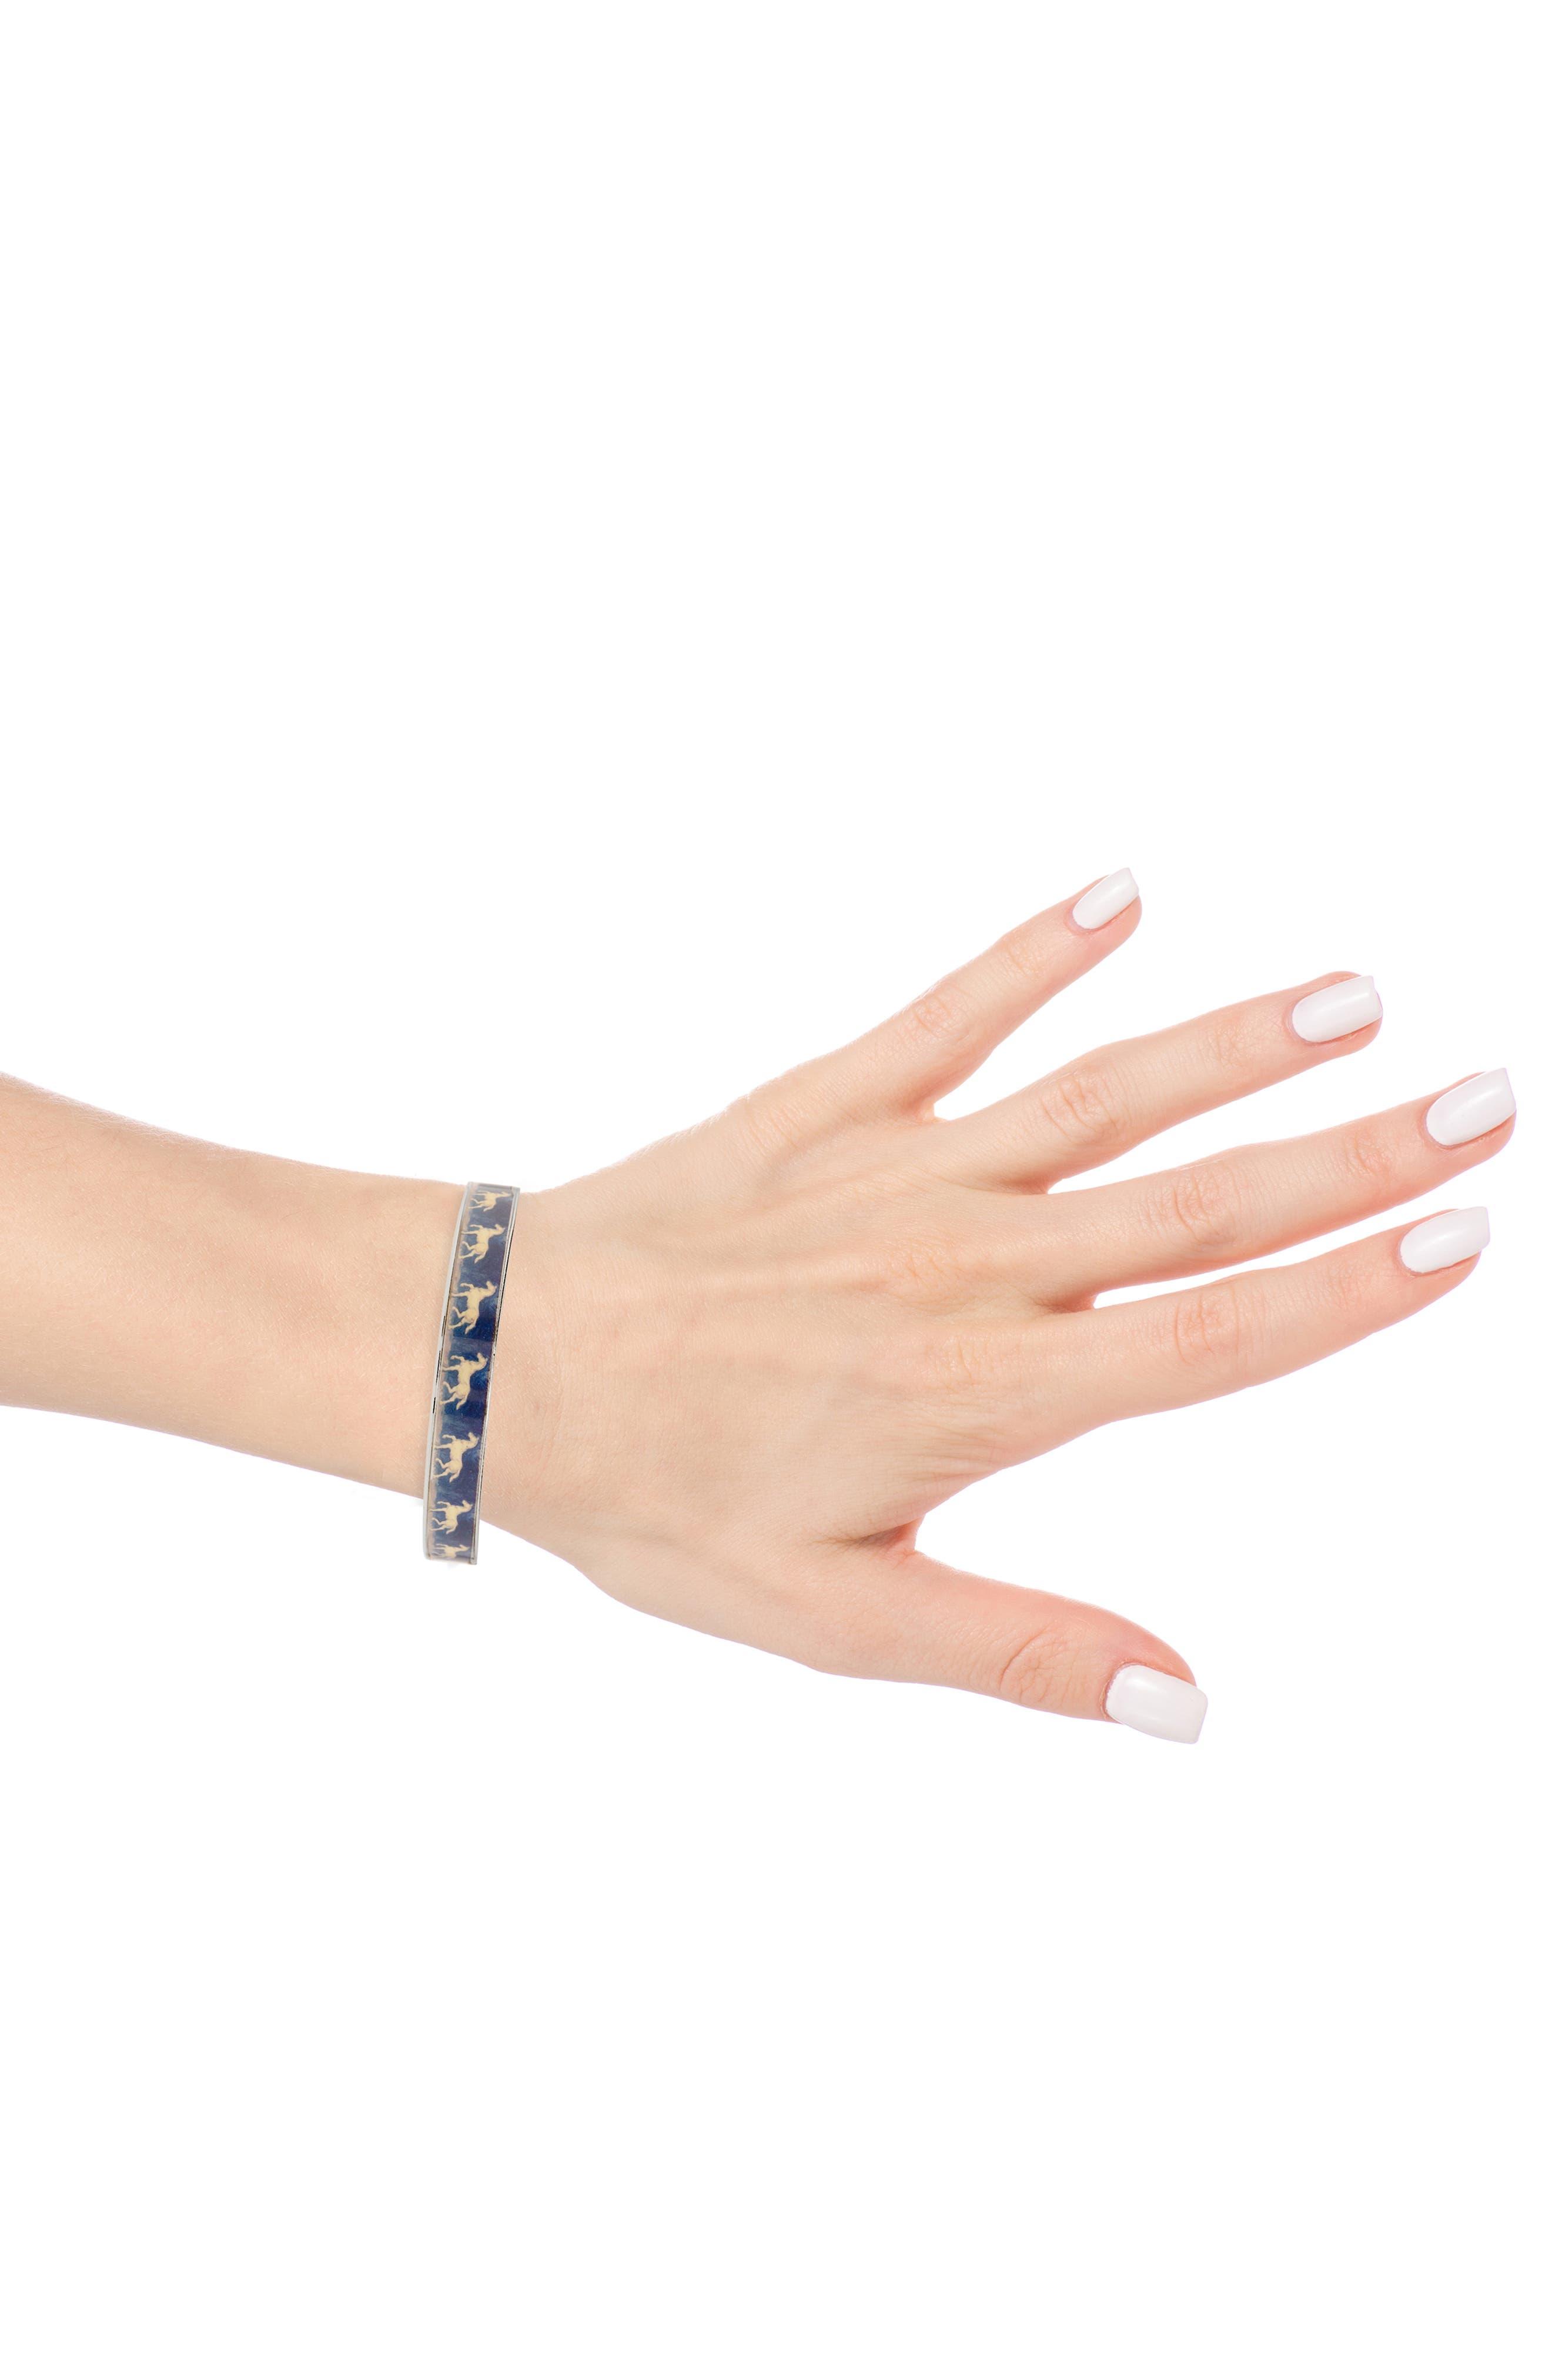 Blue Horse Medium Bracelet,                             Alternate thumbnail 2, color,                             BLUE/ SILVER